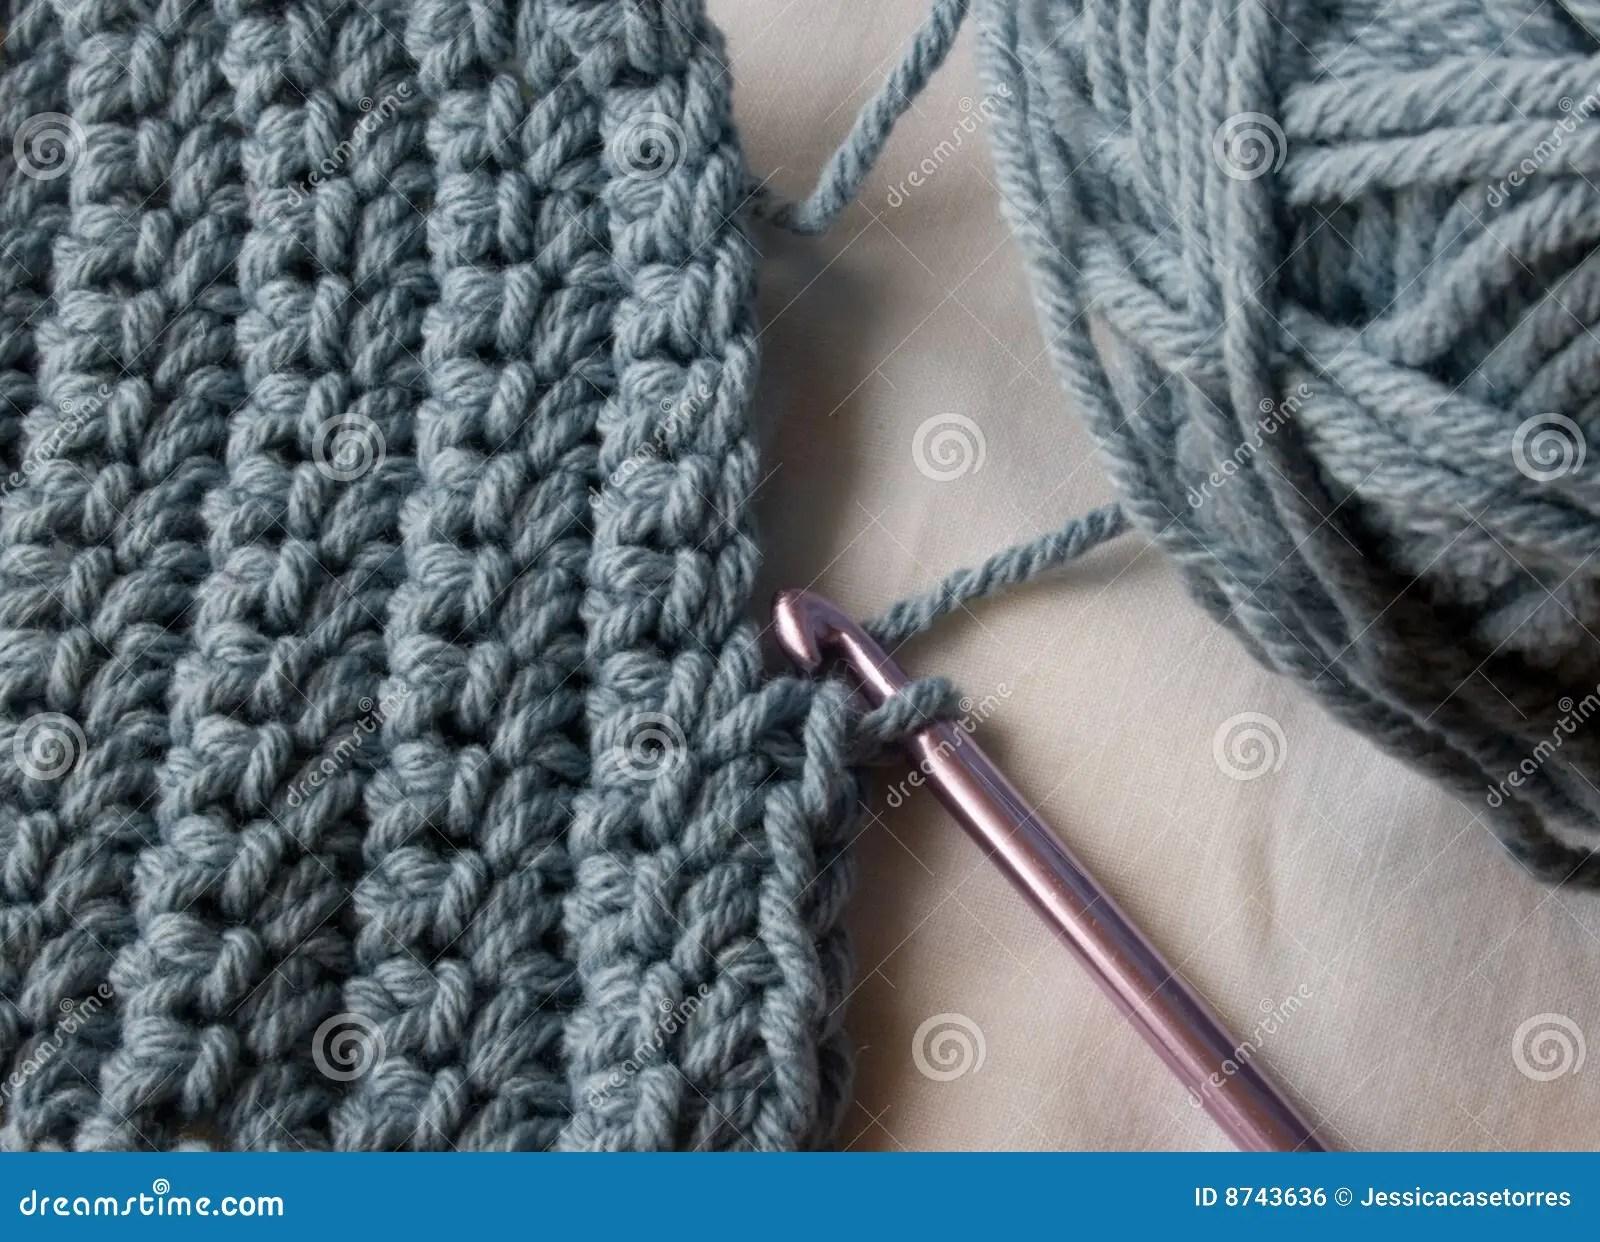 Crochet Stitches stock photo Image of crochet closeup